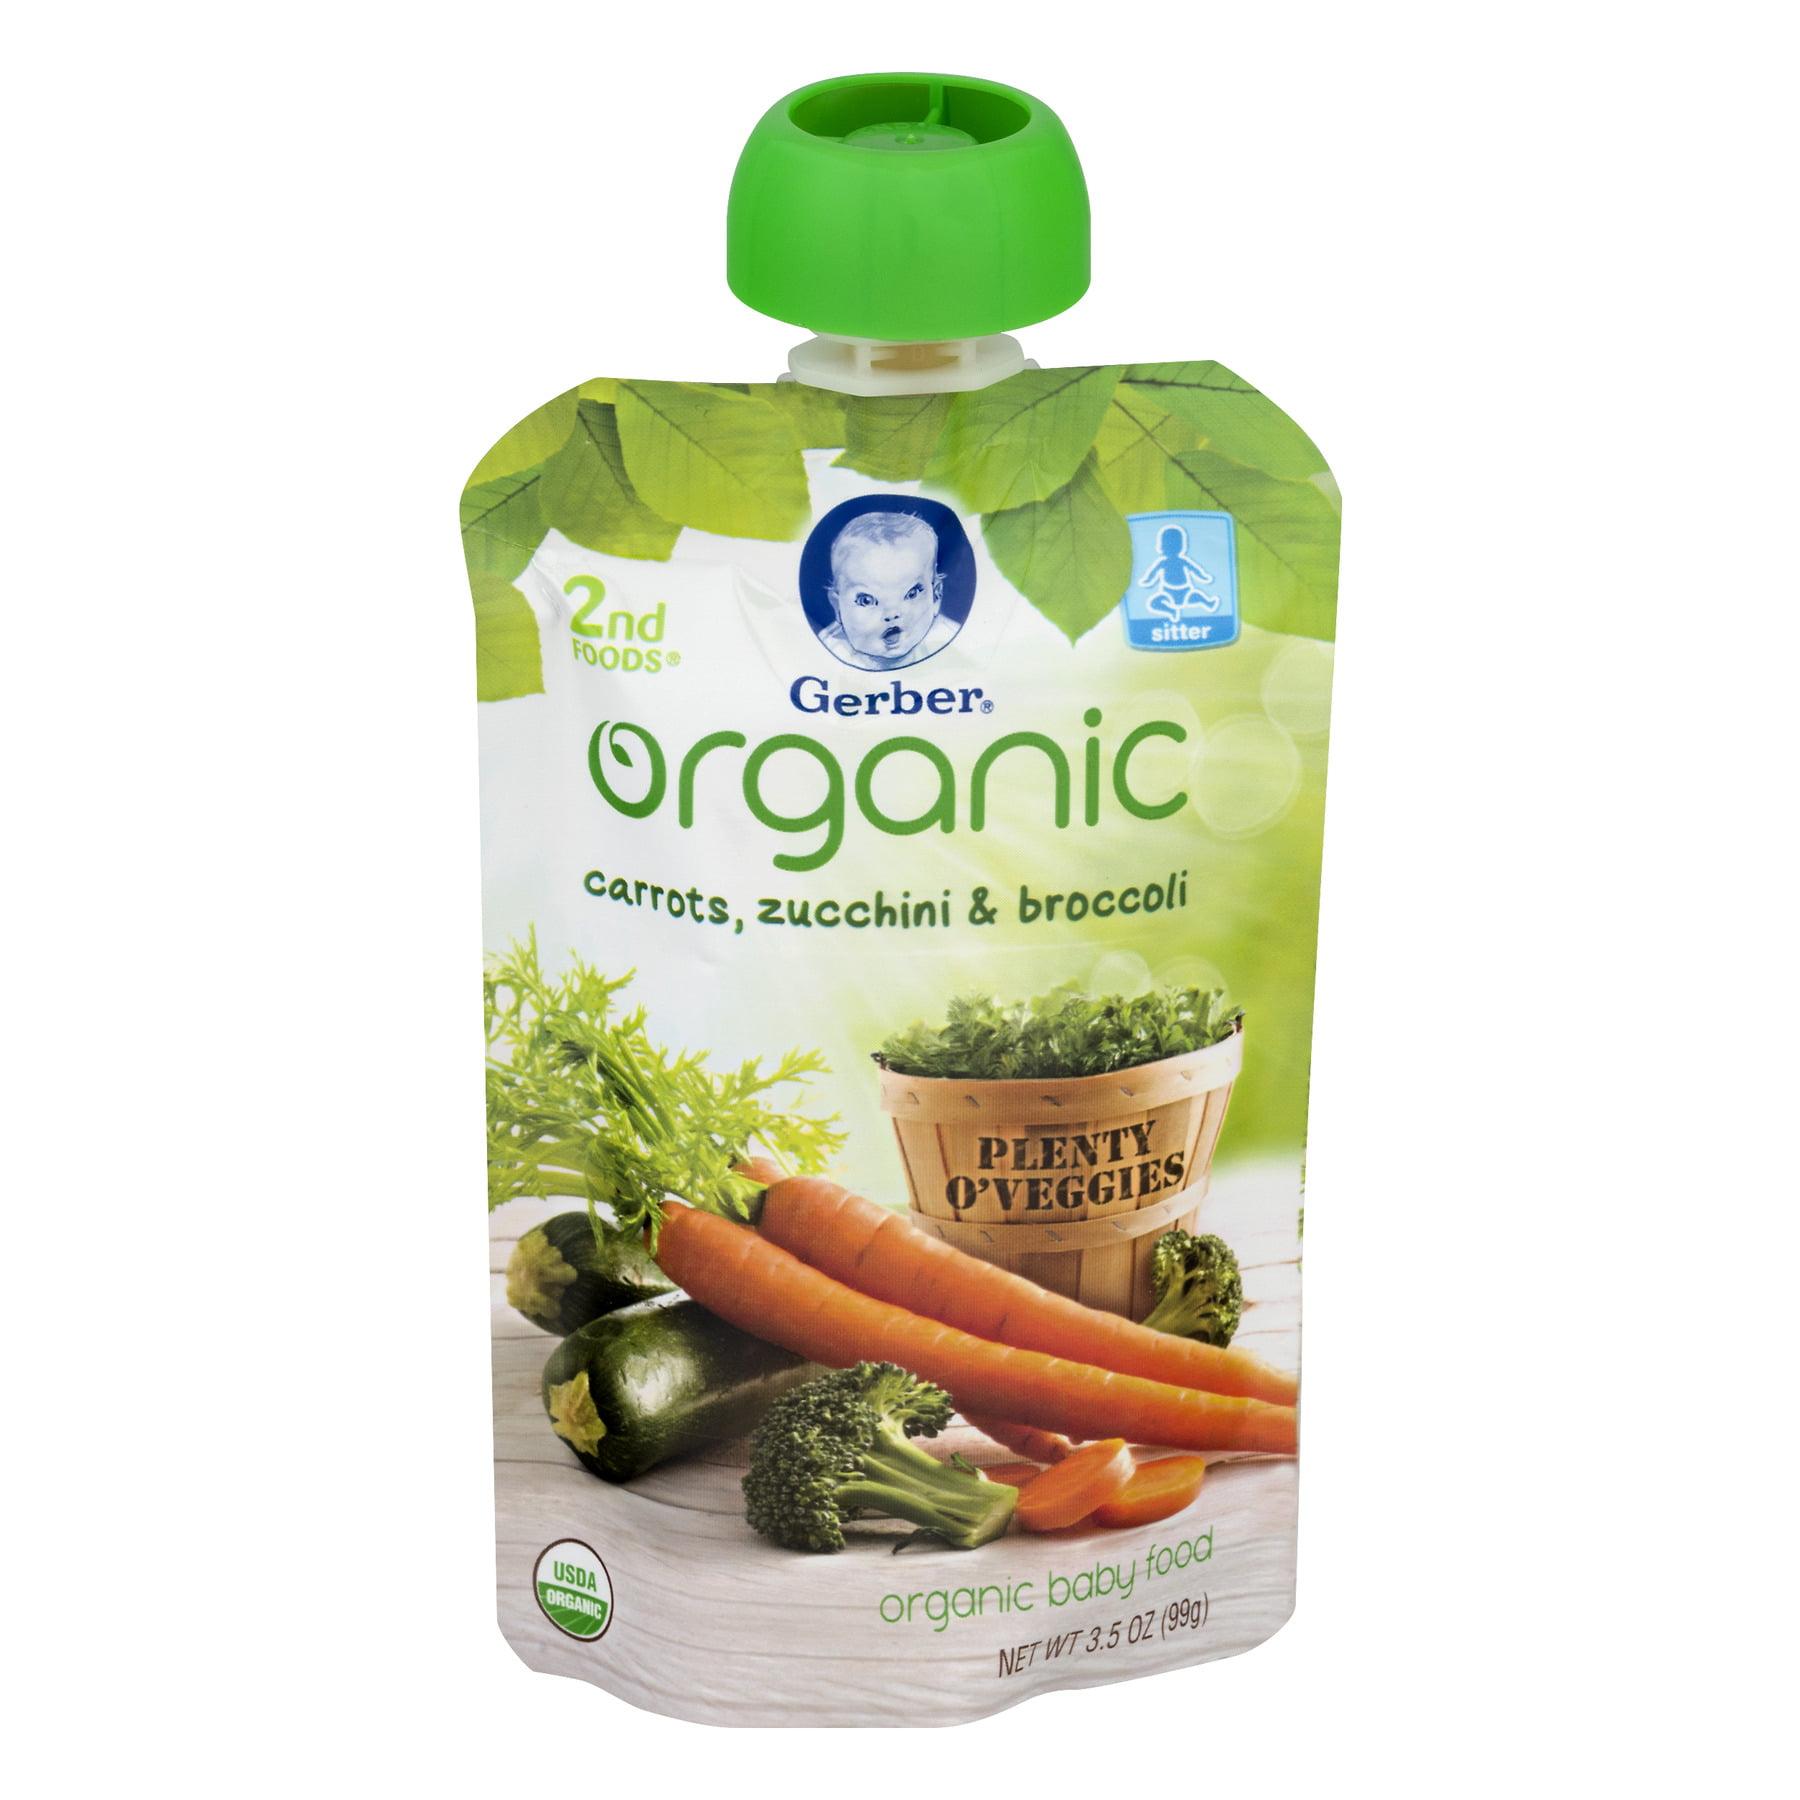 Certified organic baby food